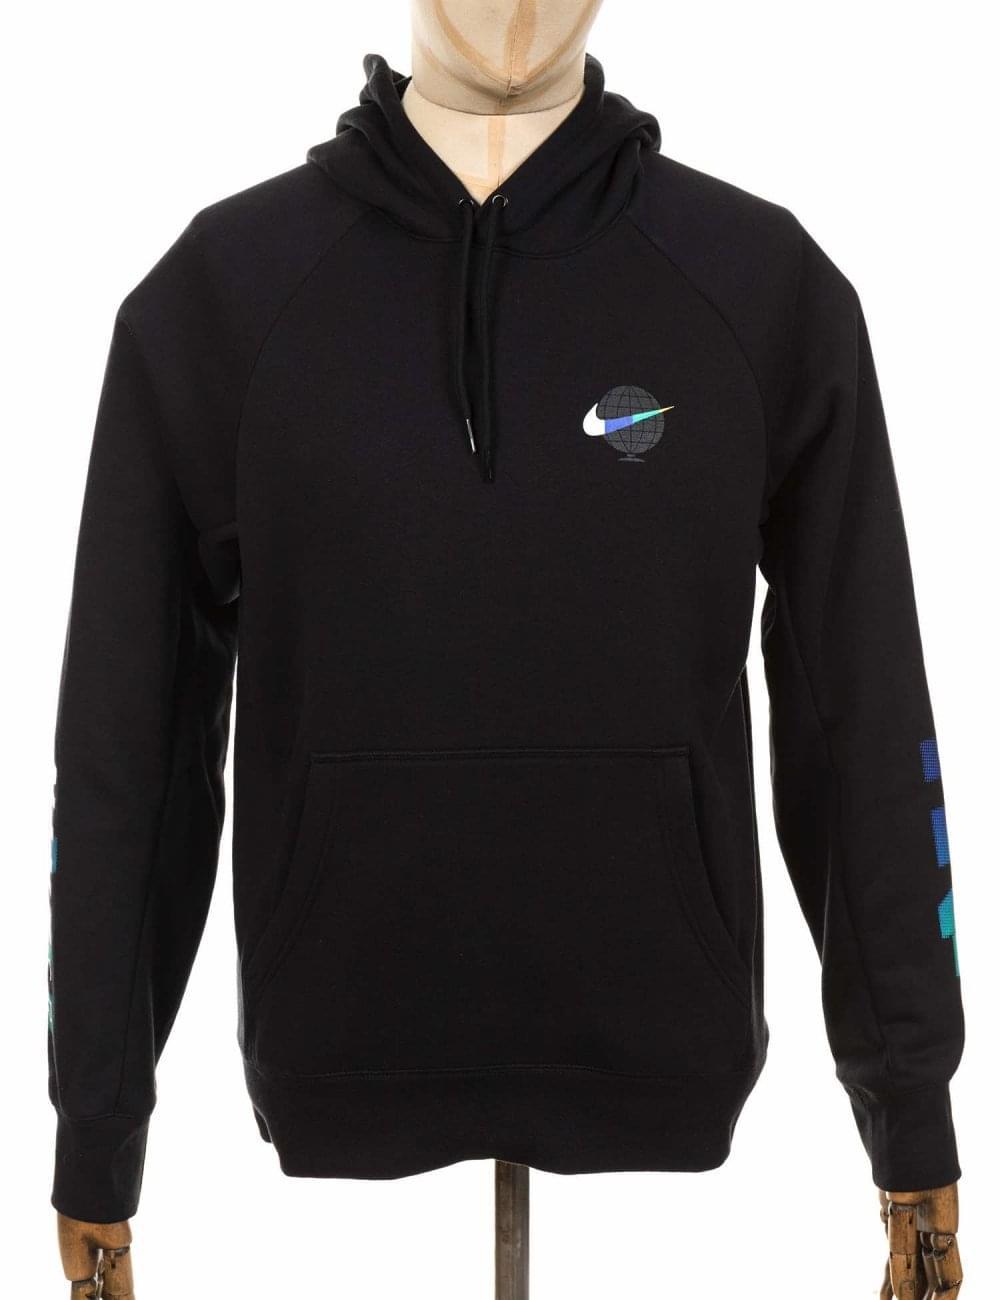 219366adc Nike SB Icon GFX Hooded Sweatshirt - Black/White - Clothing from Fat ...